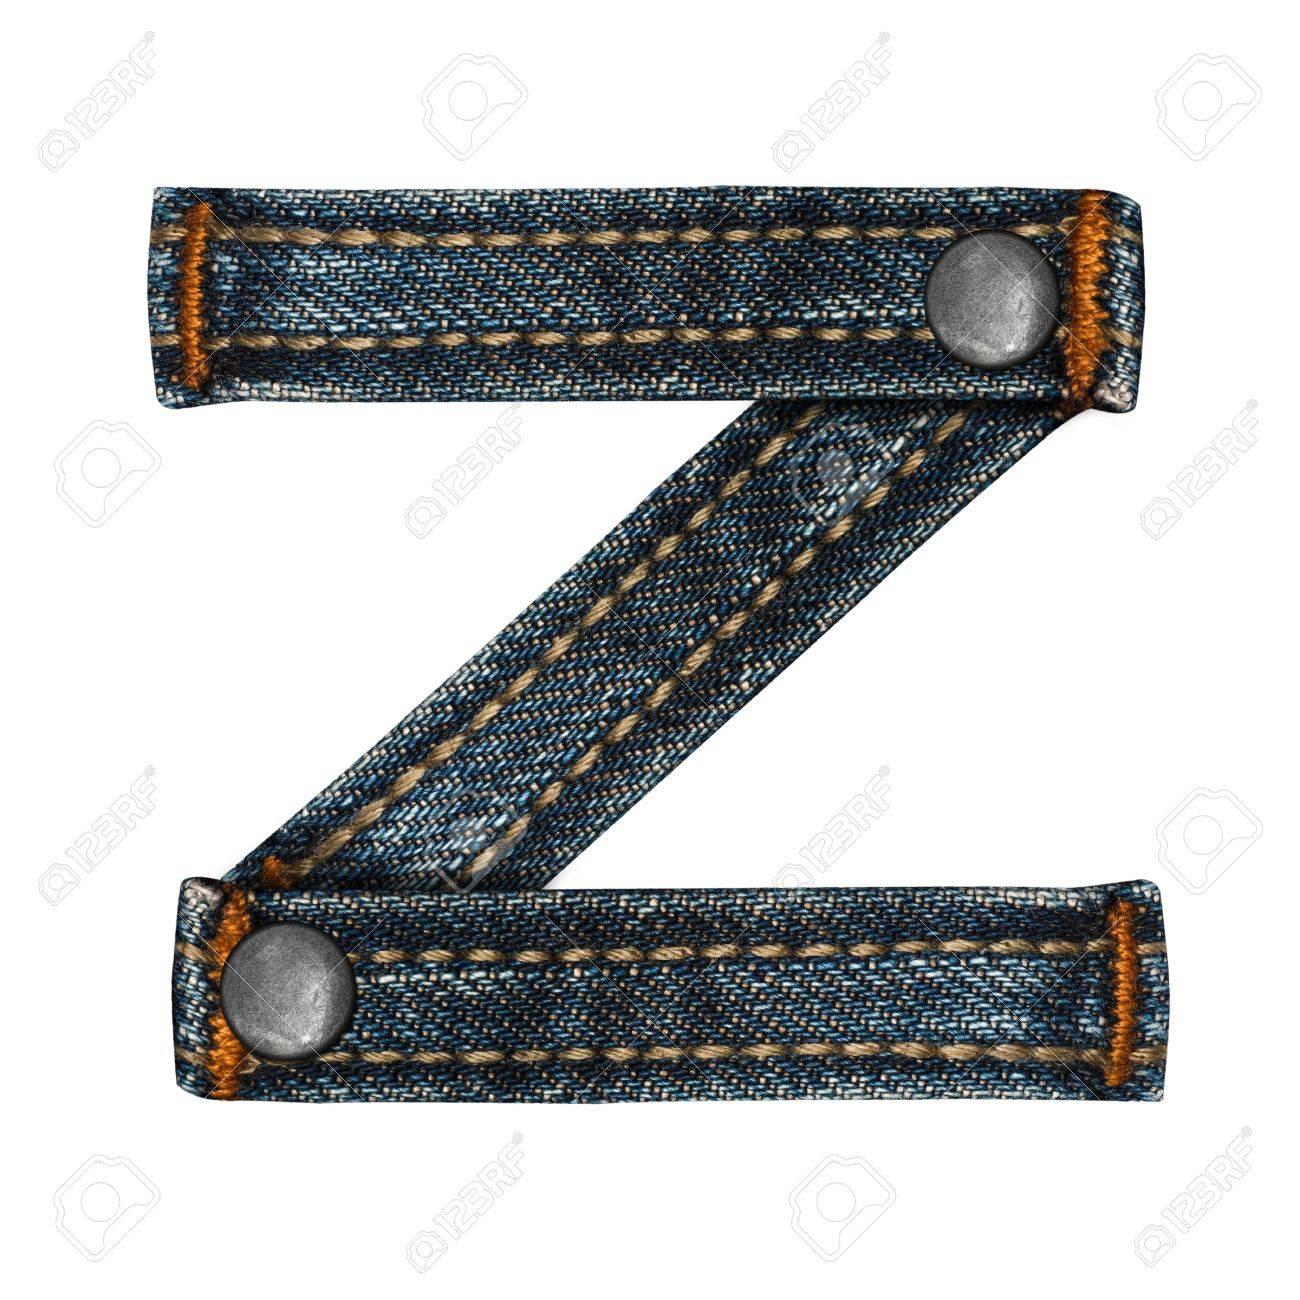 letter of jeans alphabet Stock Photo - 14150415